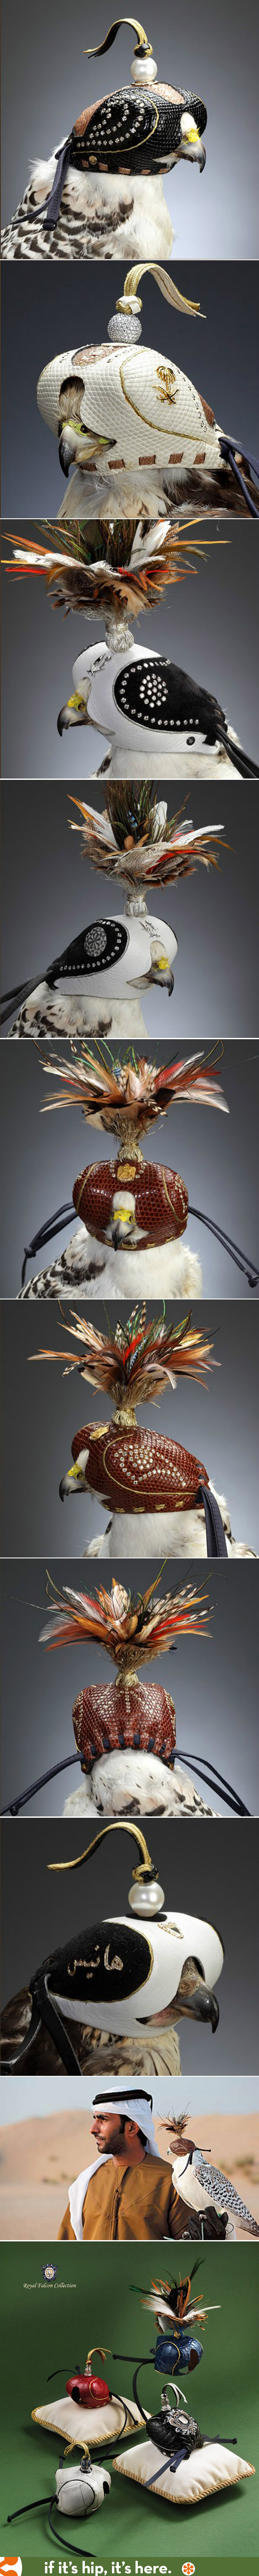 Stunning diamond-studded hoods for falconry. Wow.